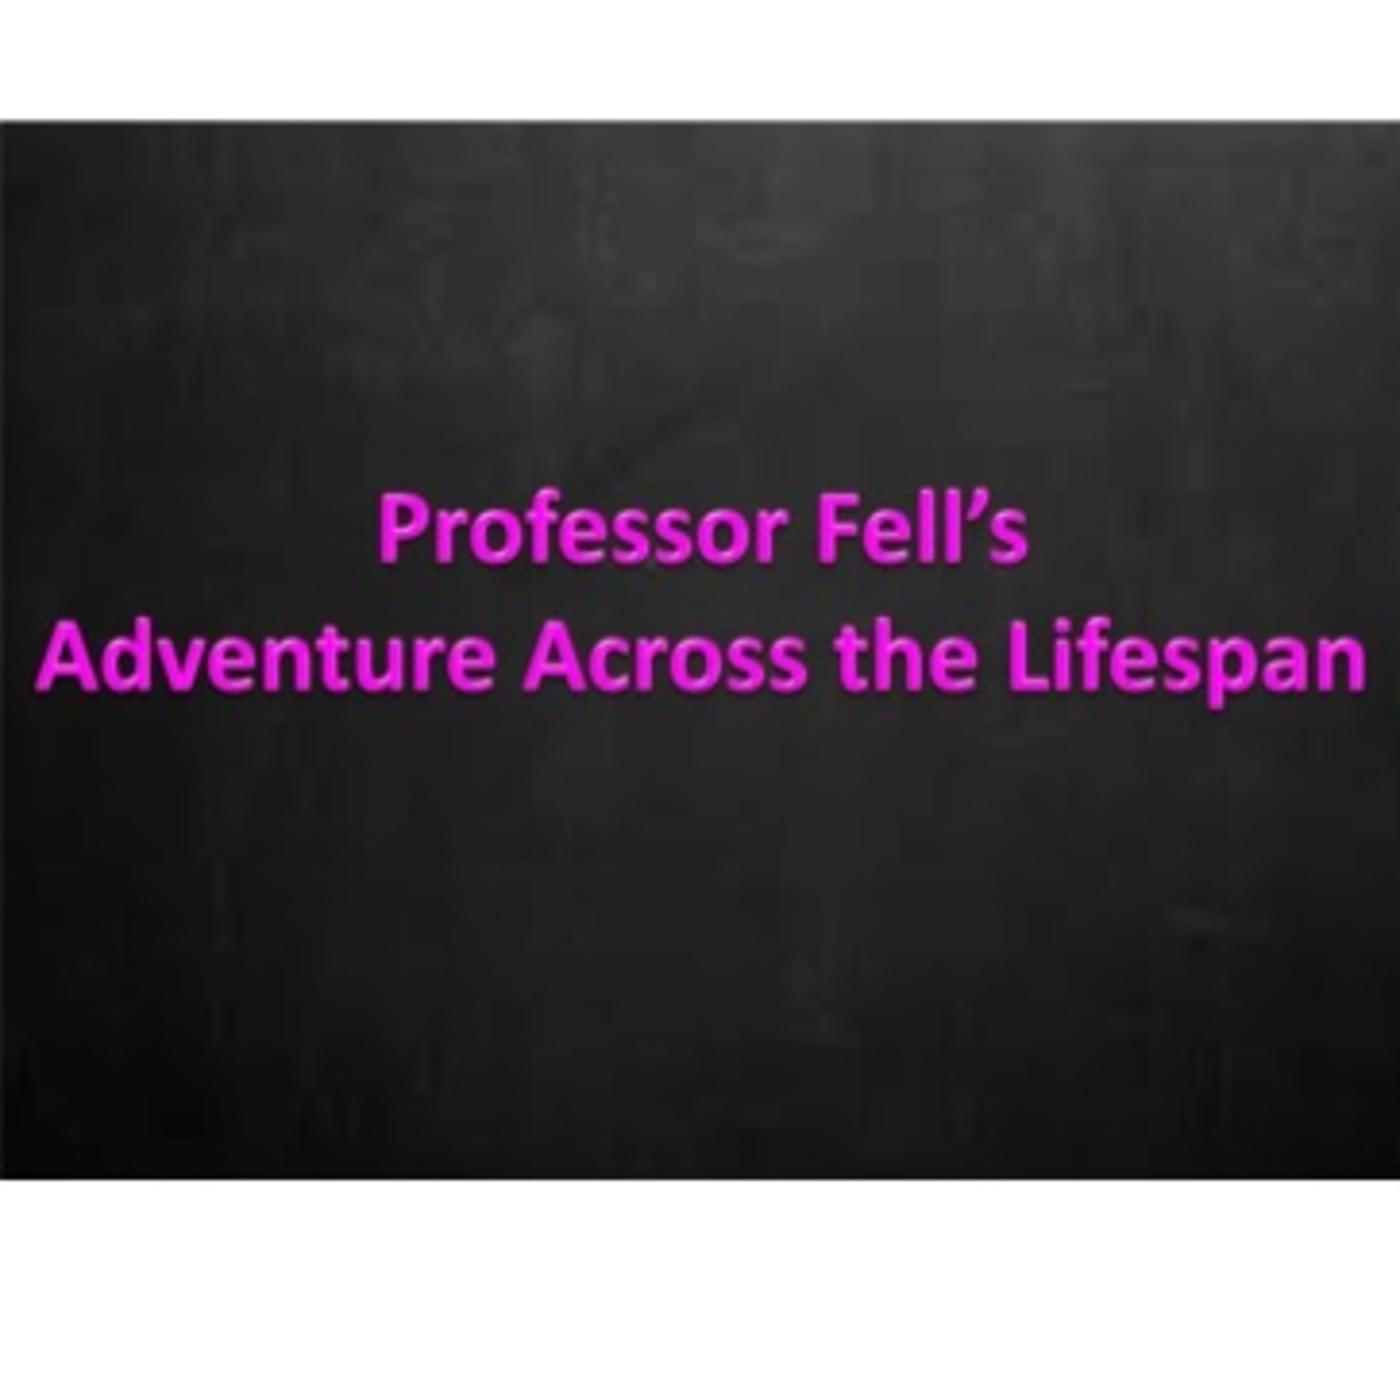 Professor Fell's Adventure Across the Lifespan